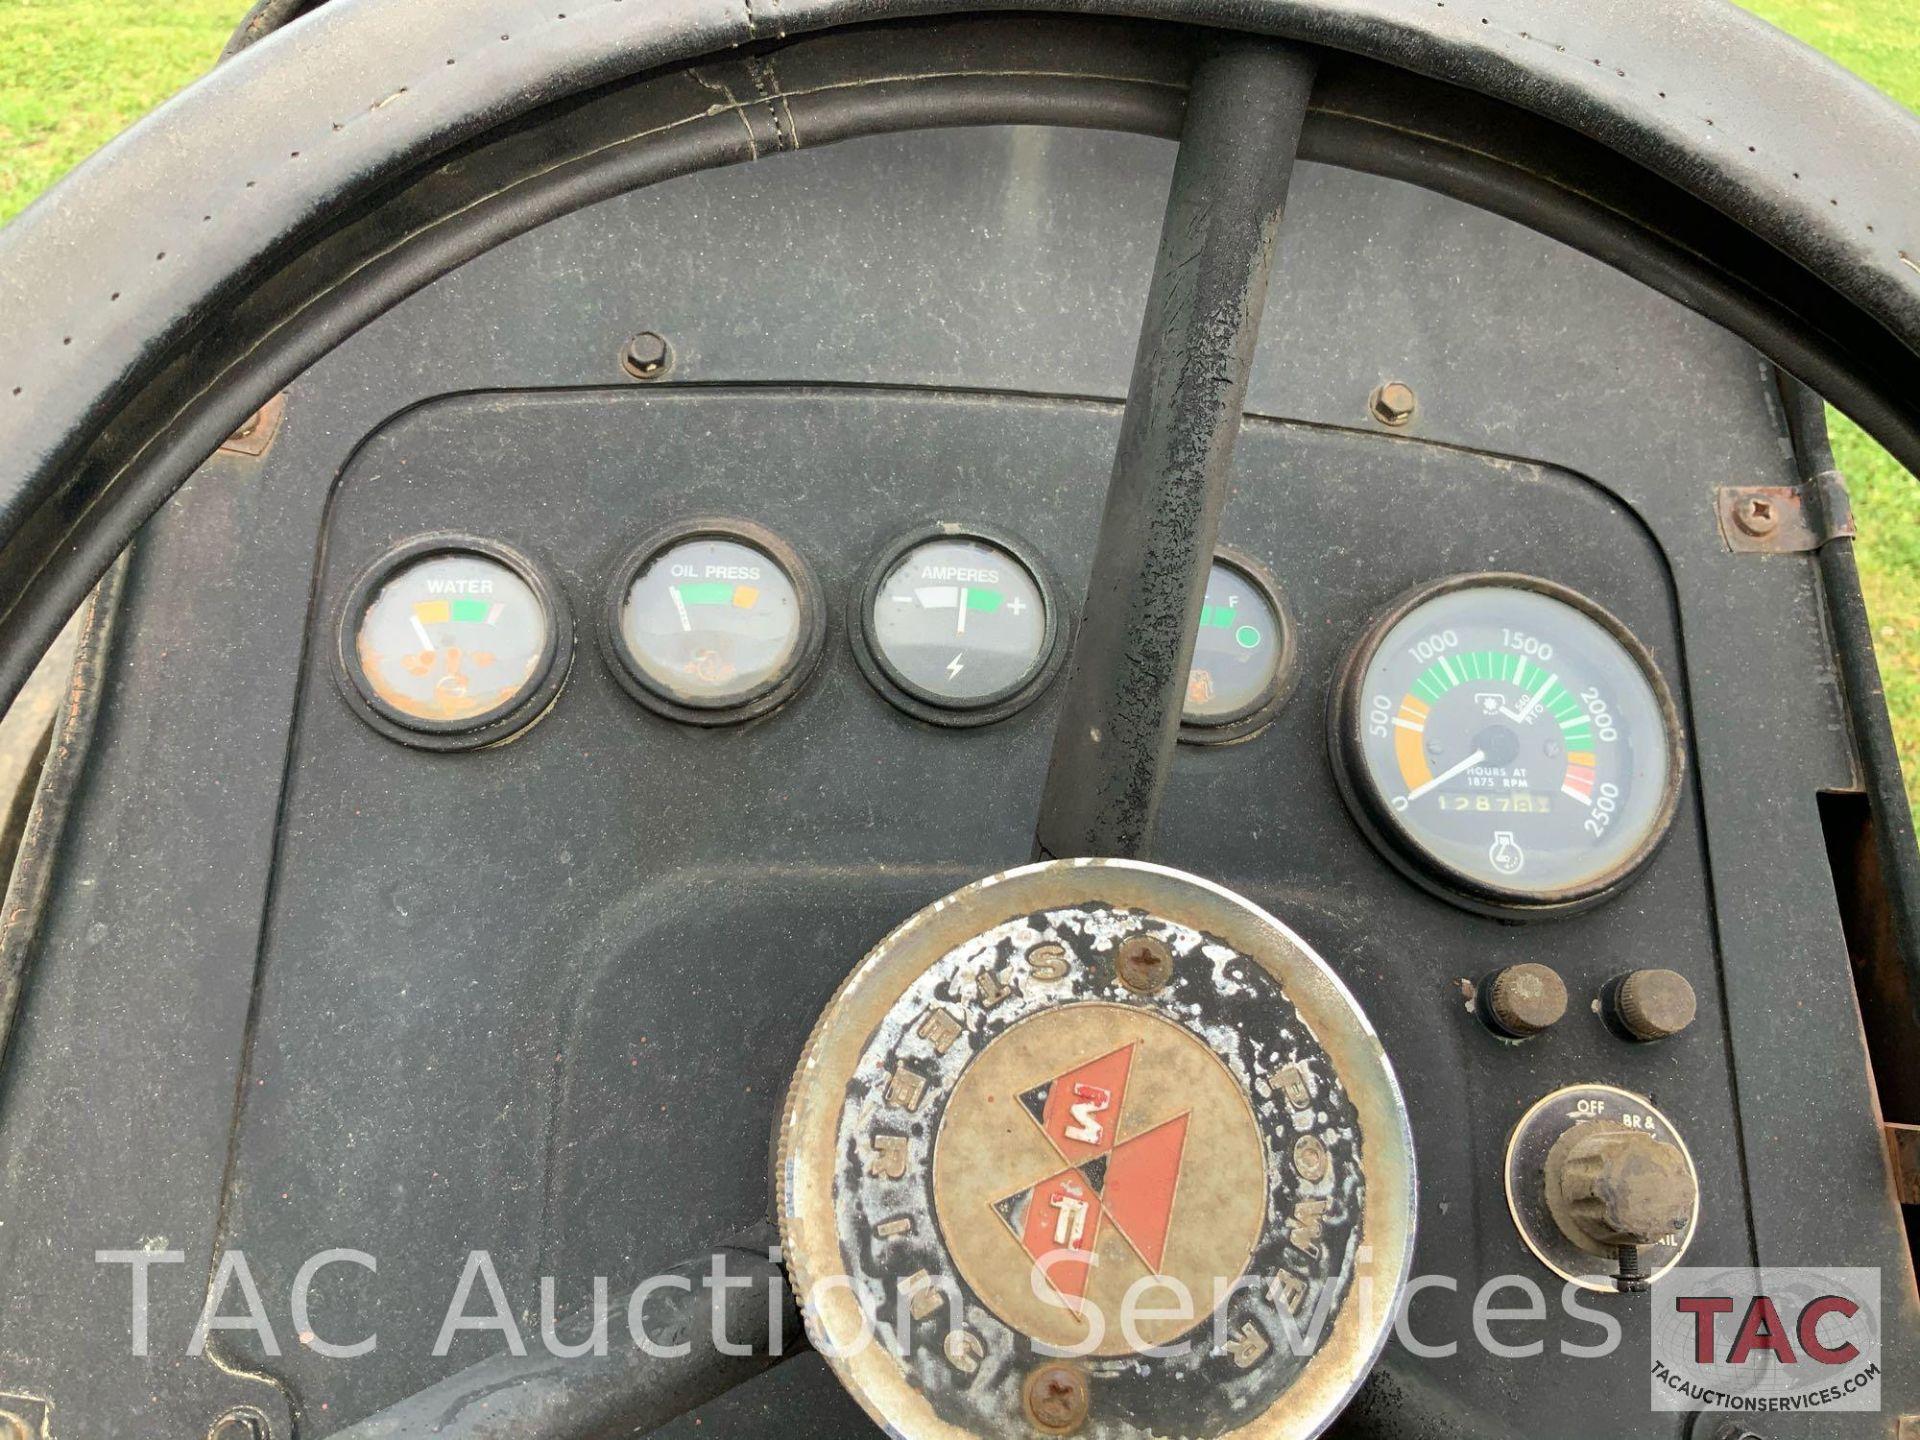 Massey Ferguson 275 Farm Tractor - Image 14 of 25